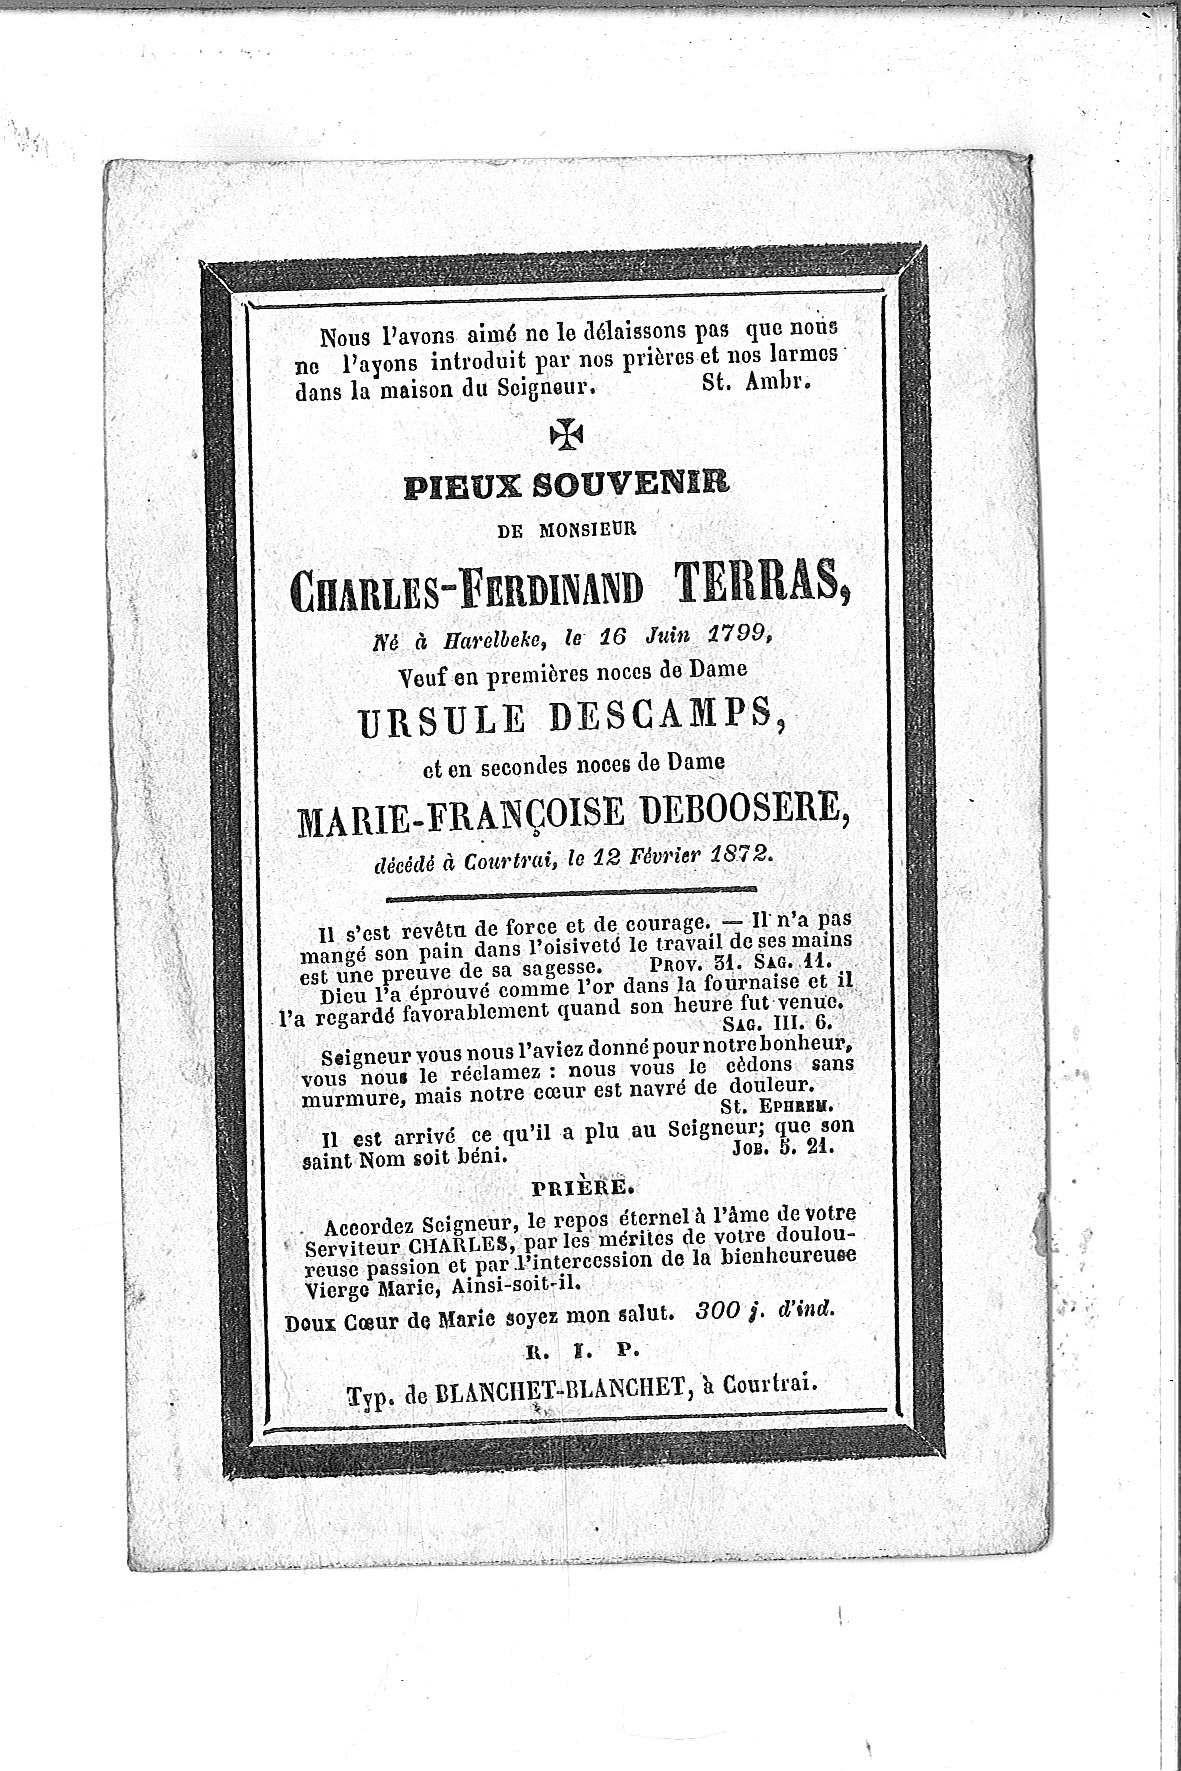 Charles-Ferdinand(1872)20140806084036_00032.jpg